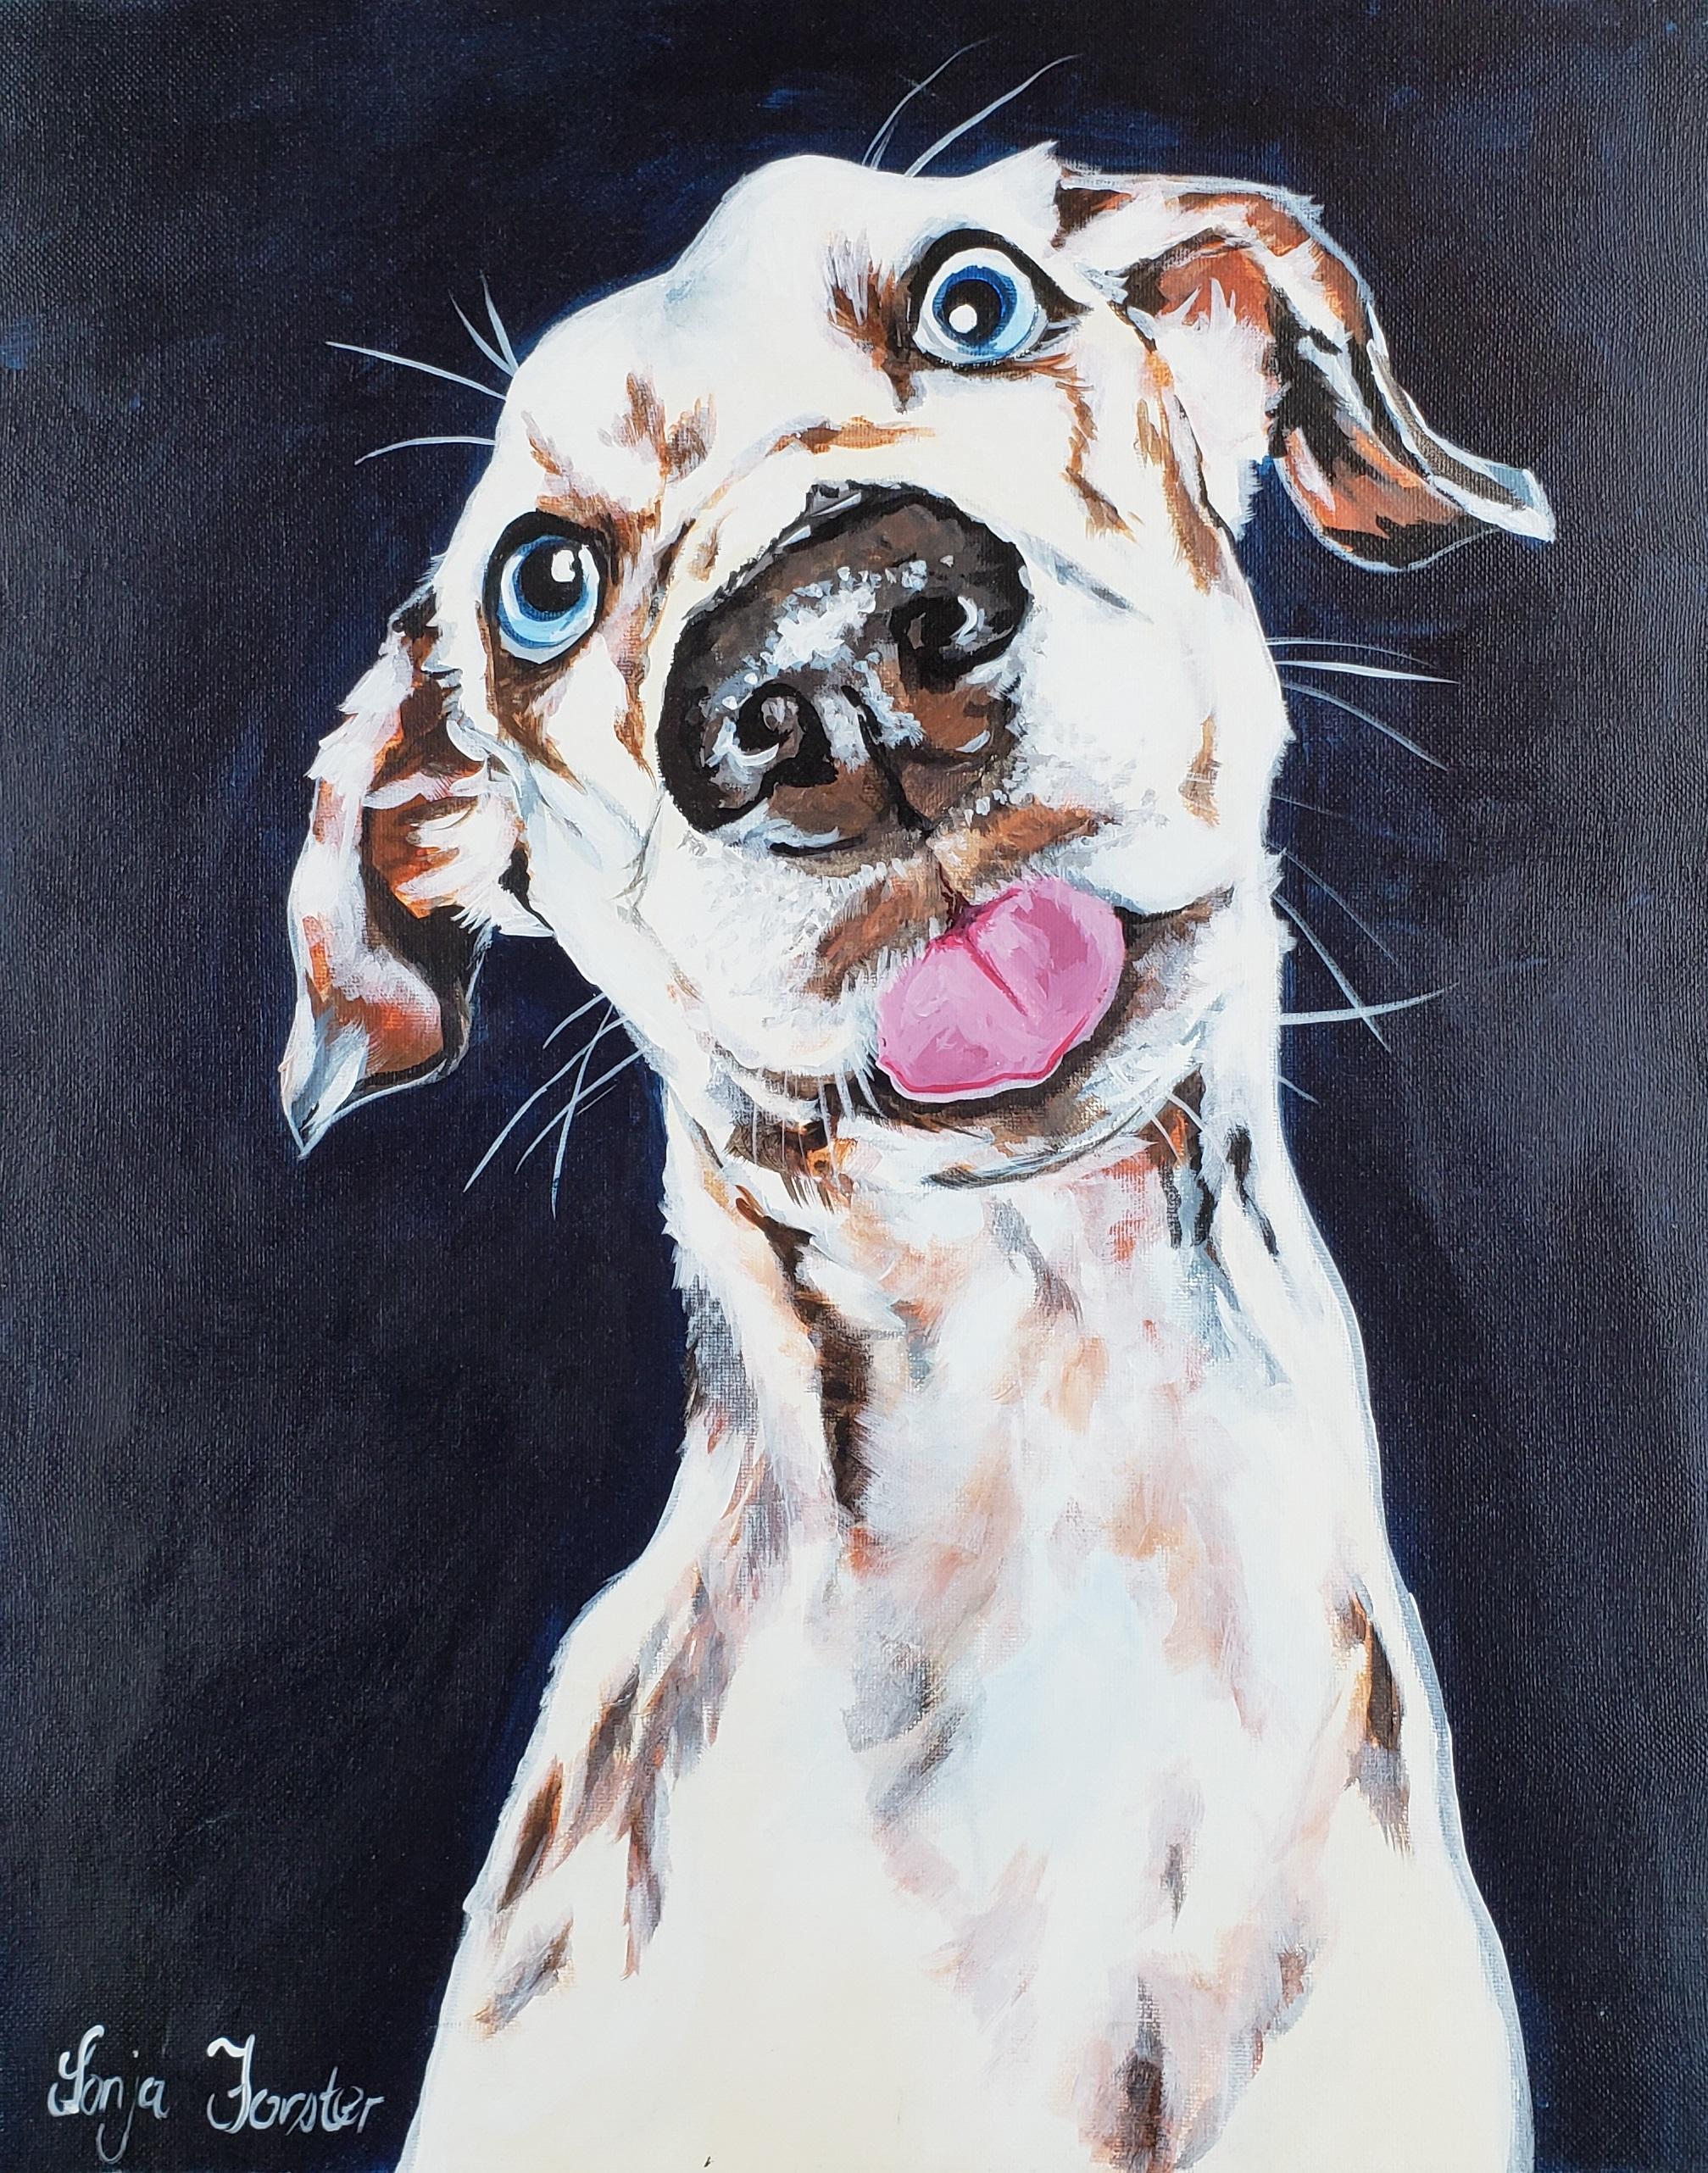 Sonja Forster Art - Paint Your Pet 1_original.jpg